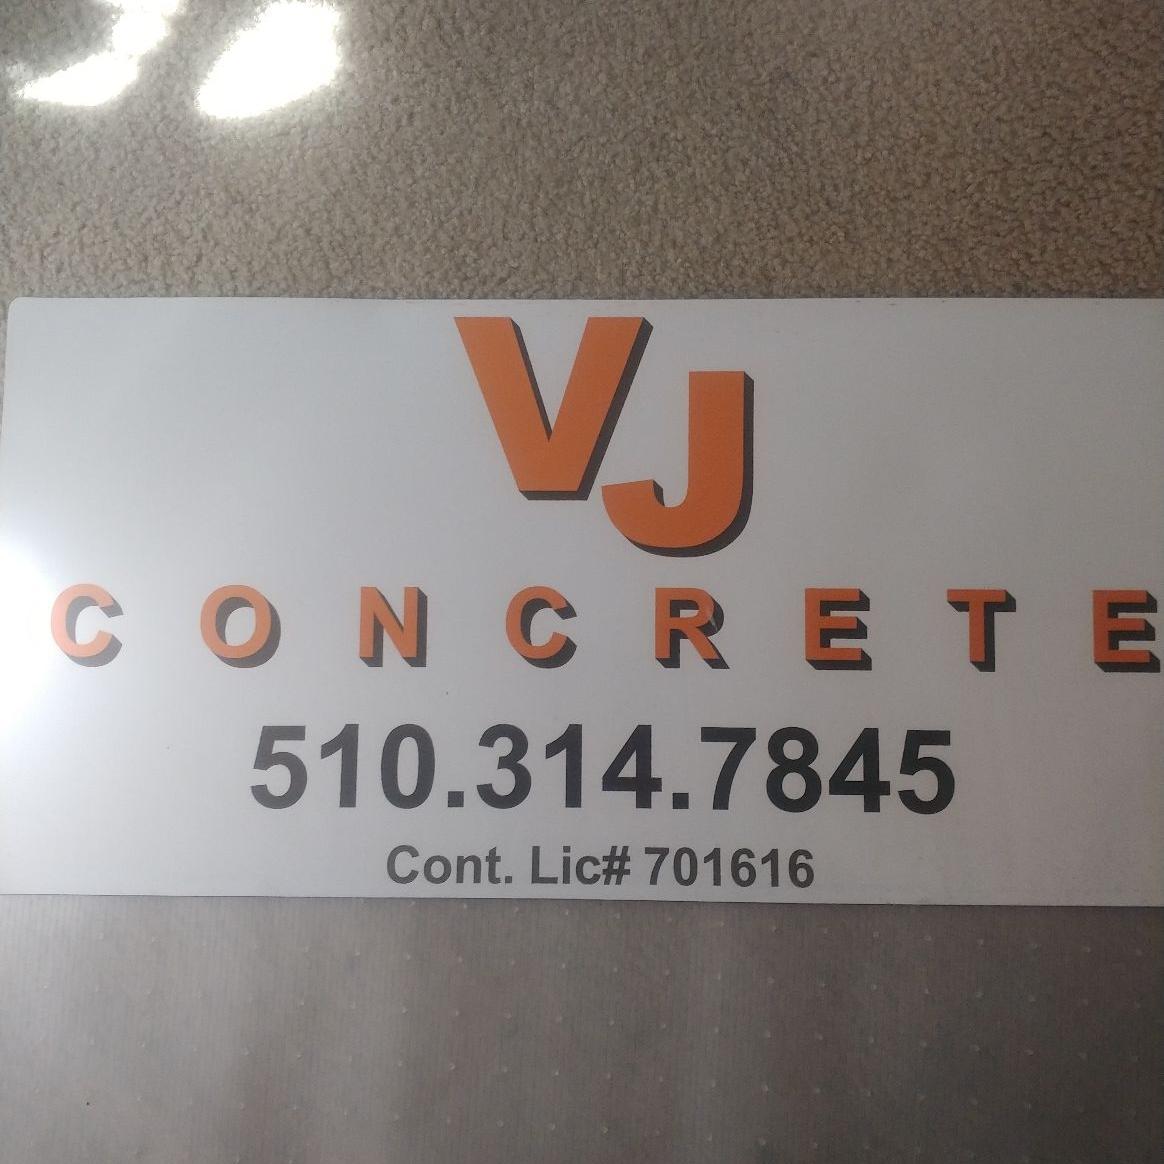 VJ Concrete